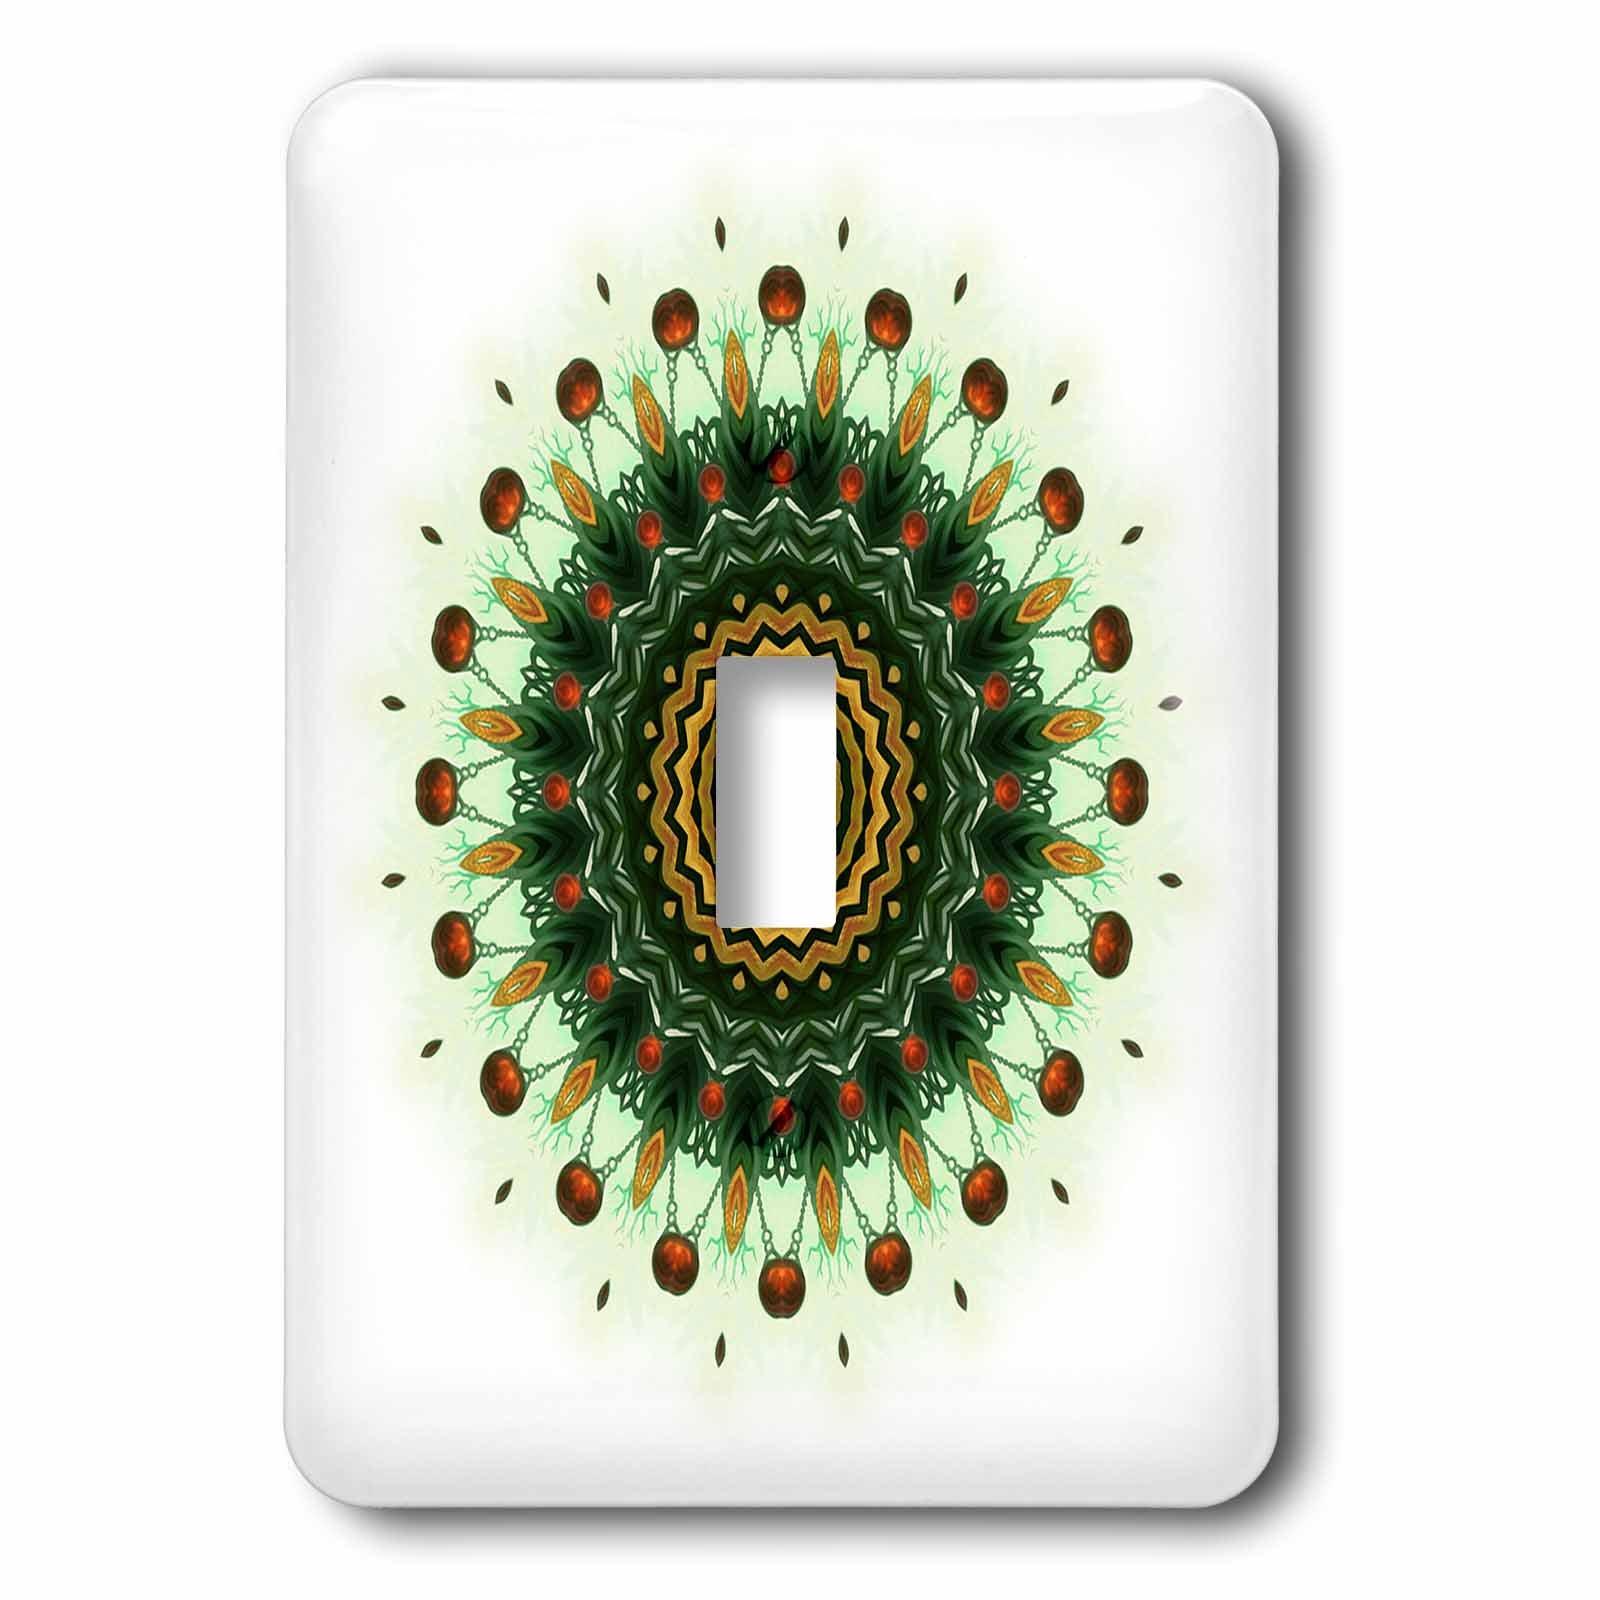 3dRose lsp_42266_1 India Ornament Flake Mandala Light Switch Cover